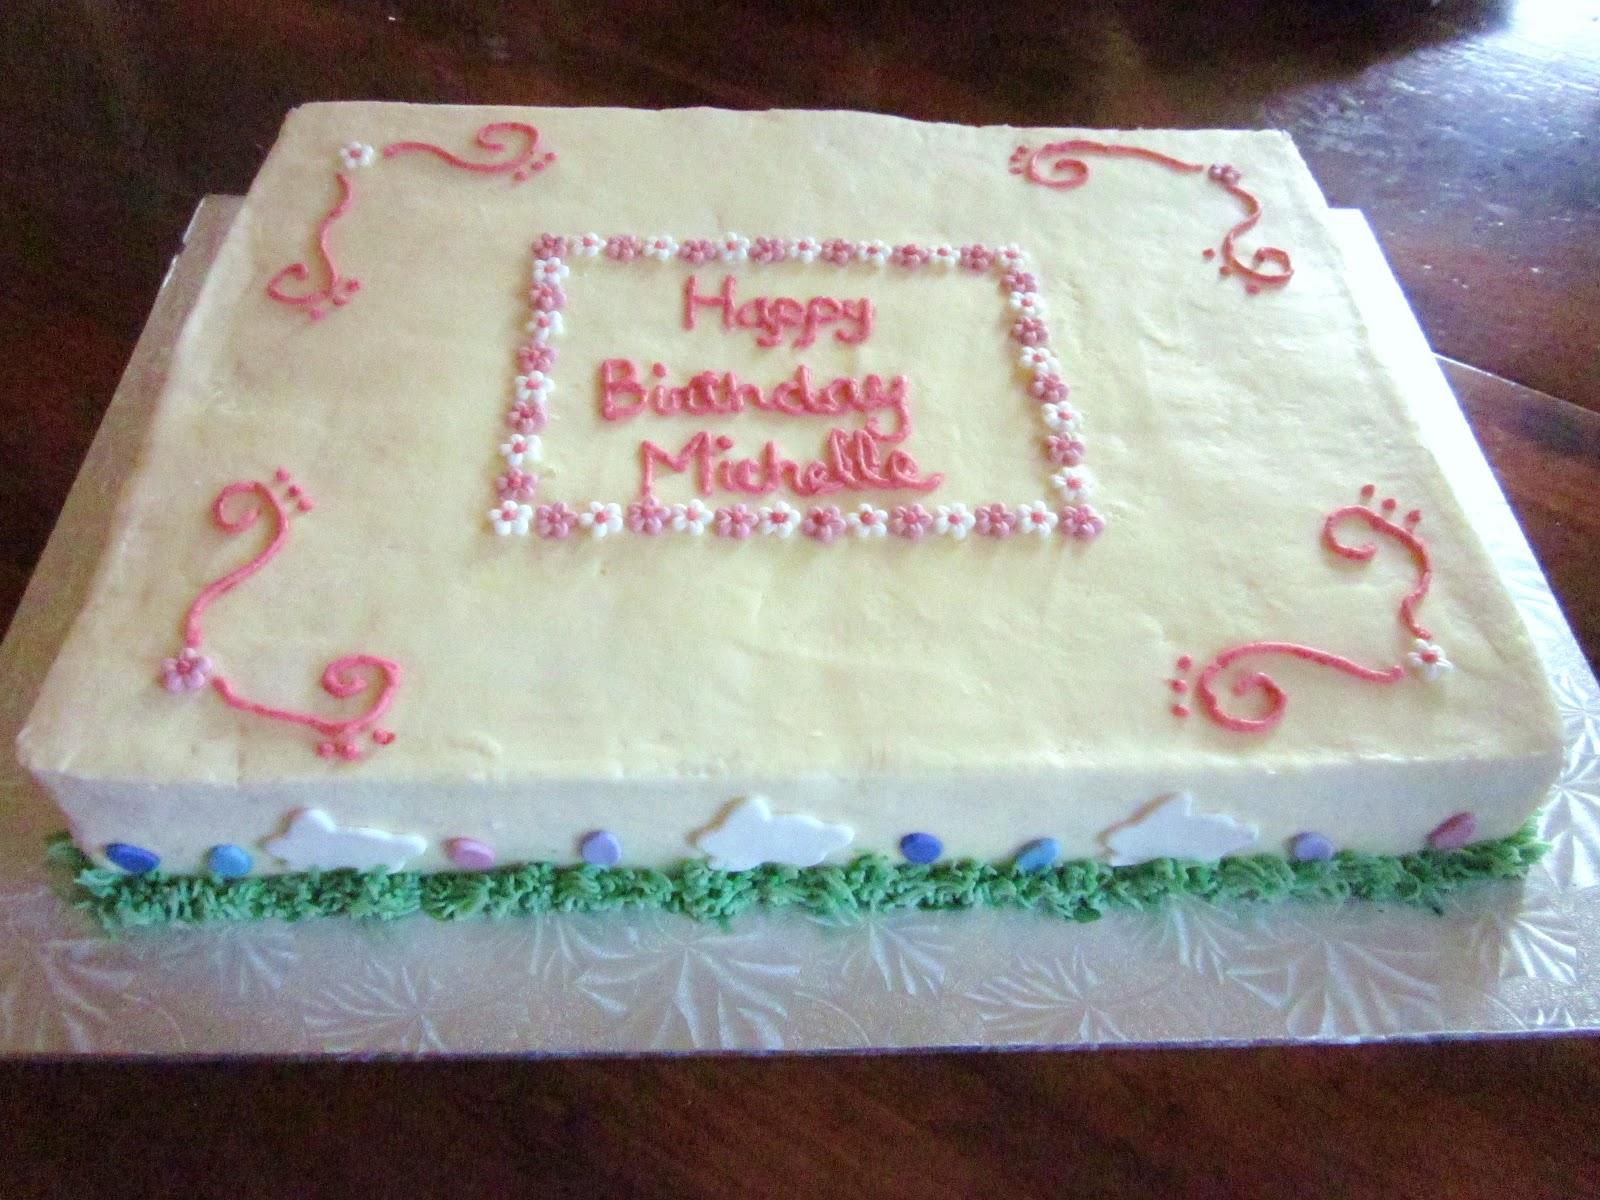 Second Generation Cake Design Easter Birthday Cake